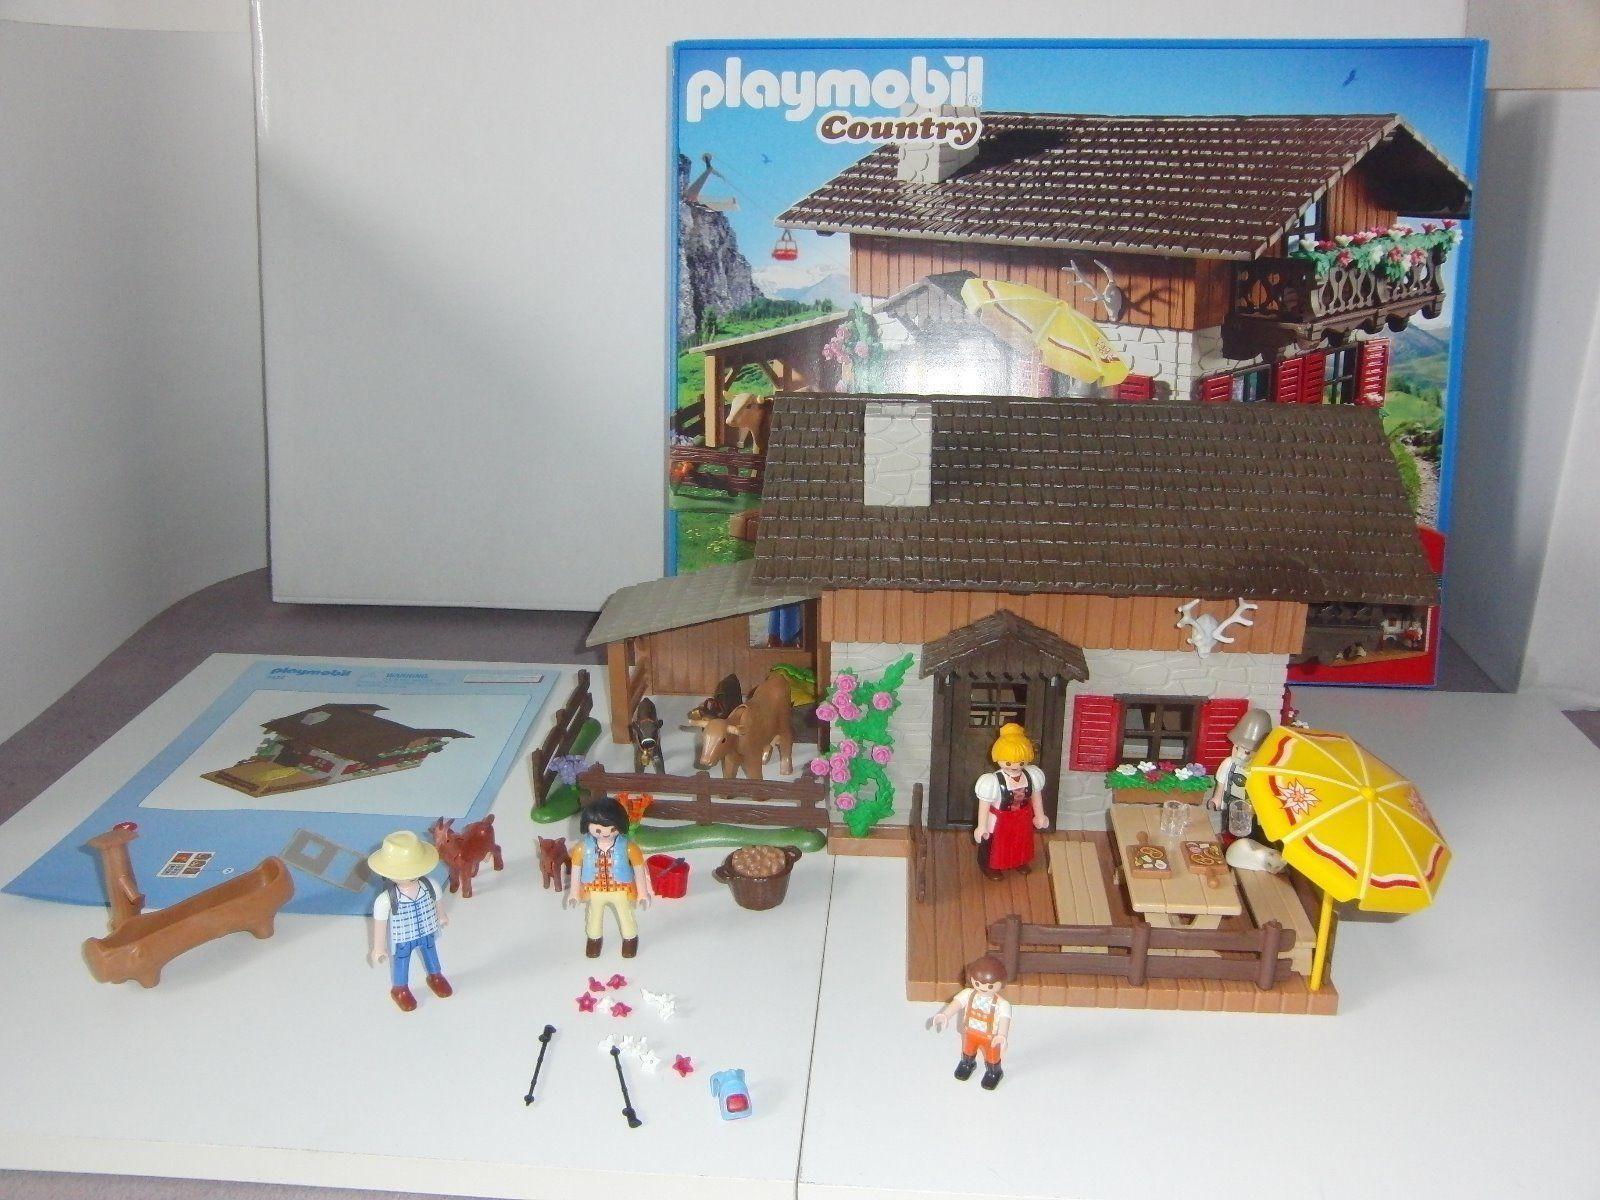 Playmobil country alpine lodge